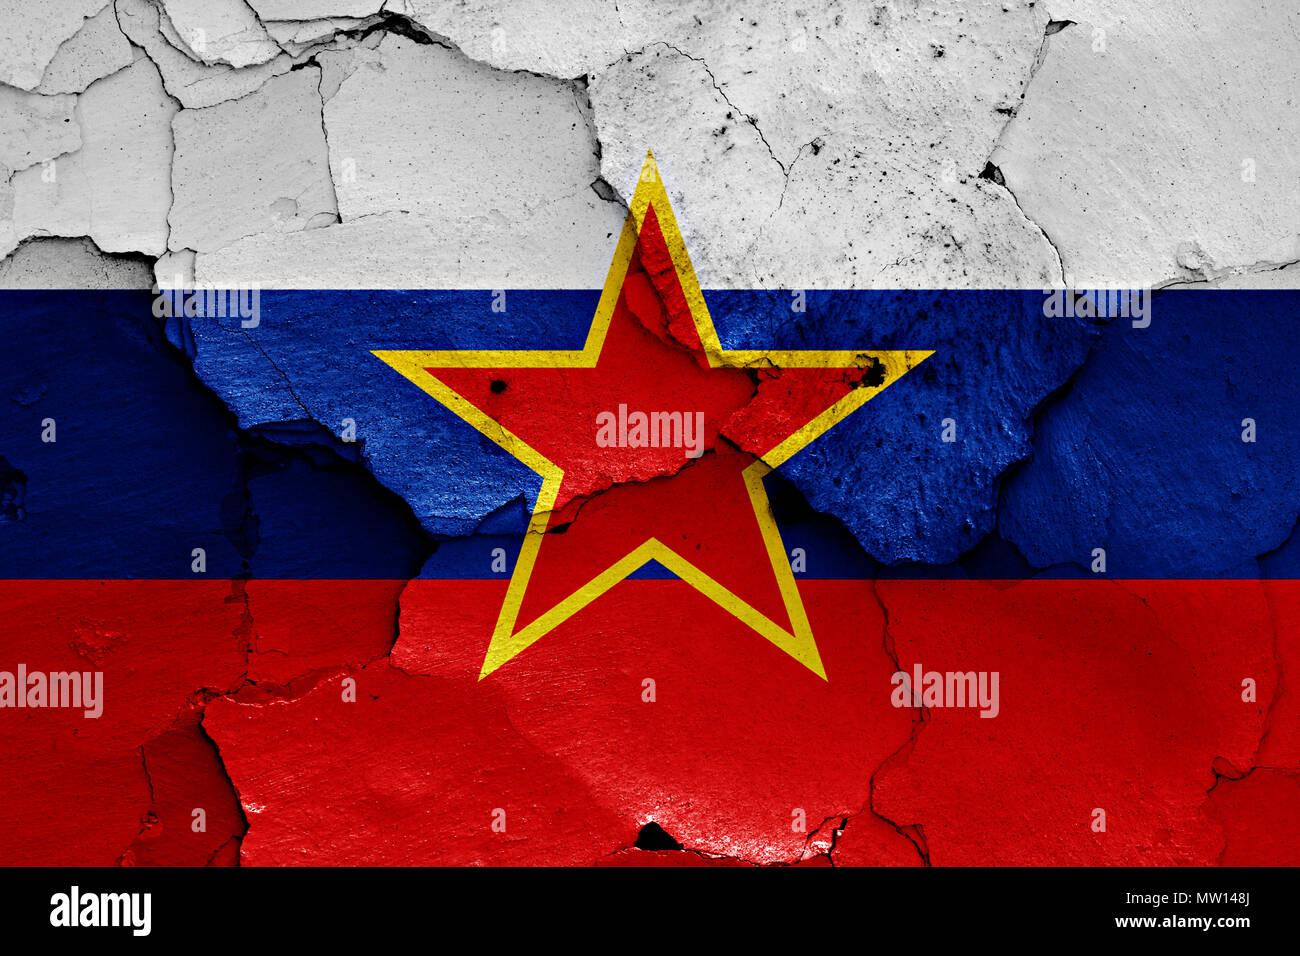 Flagge der Sozialistischen Republik Slowenien Stockbild